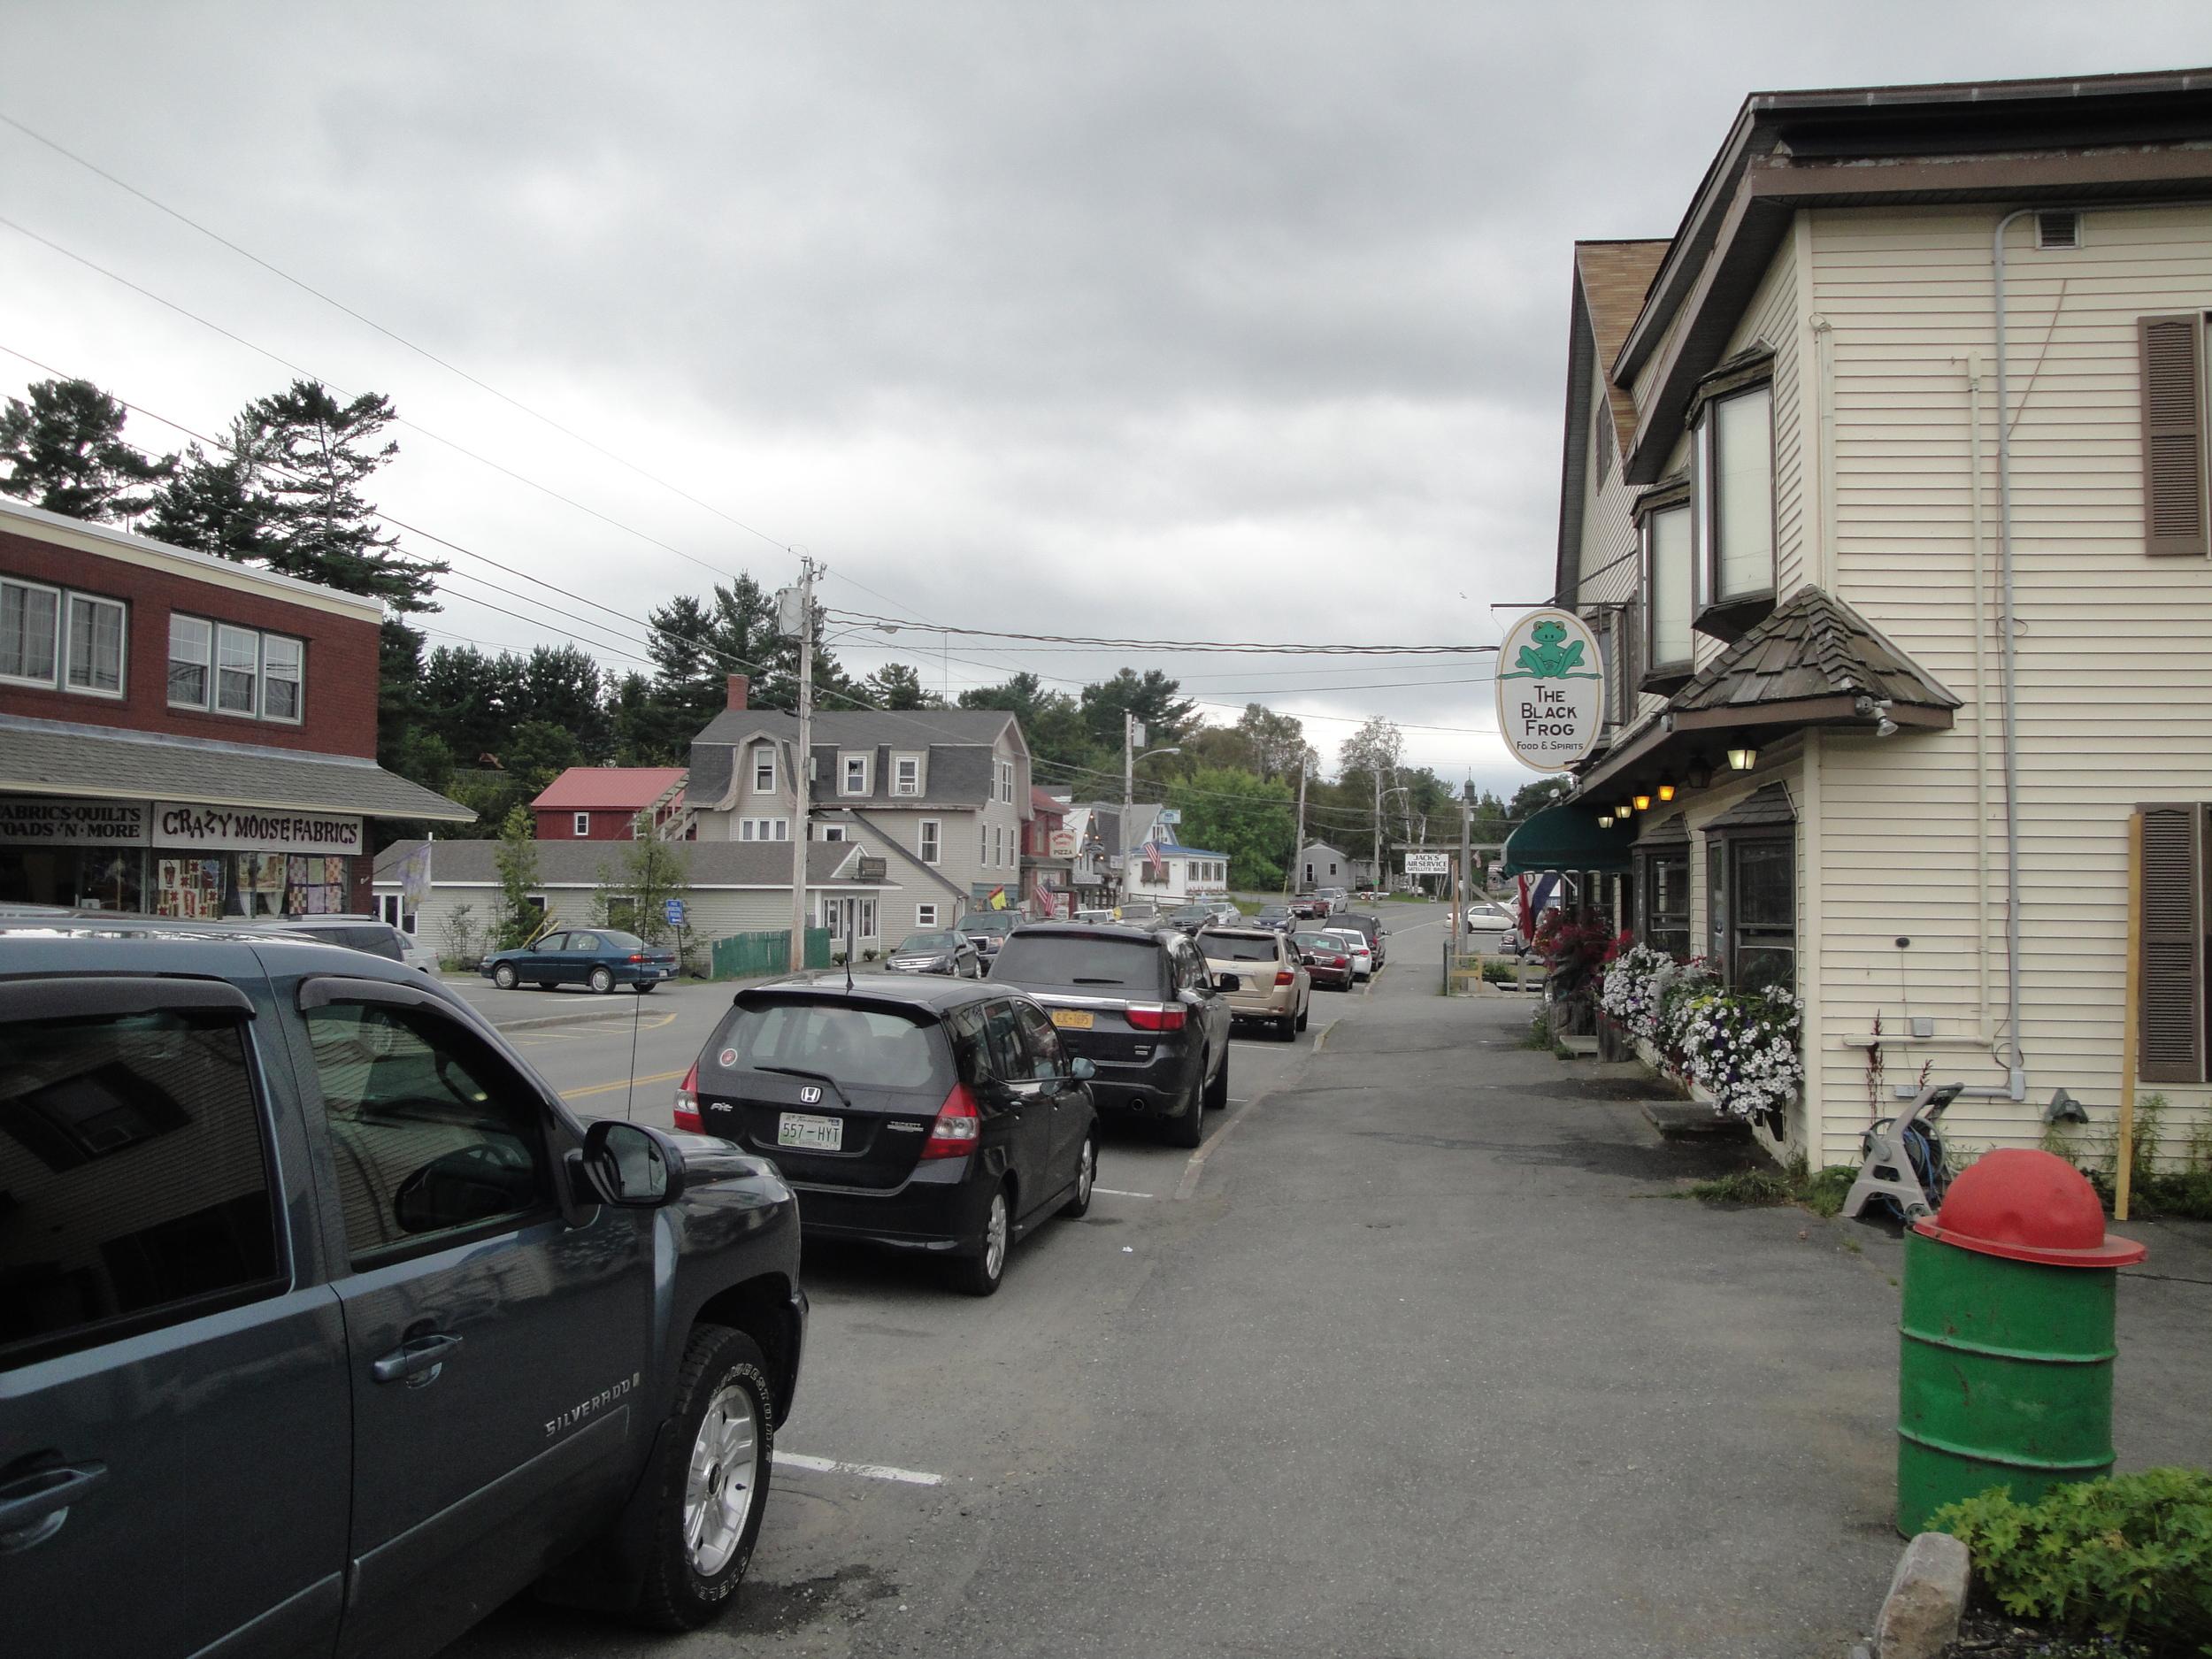 Small-town urban